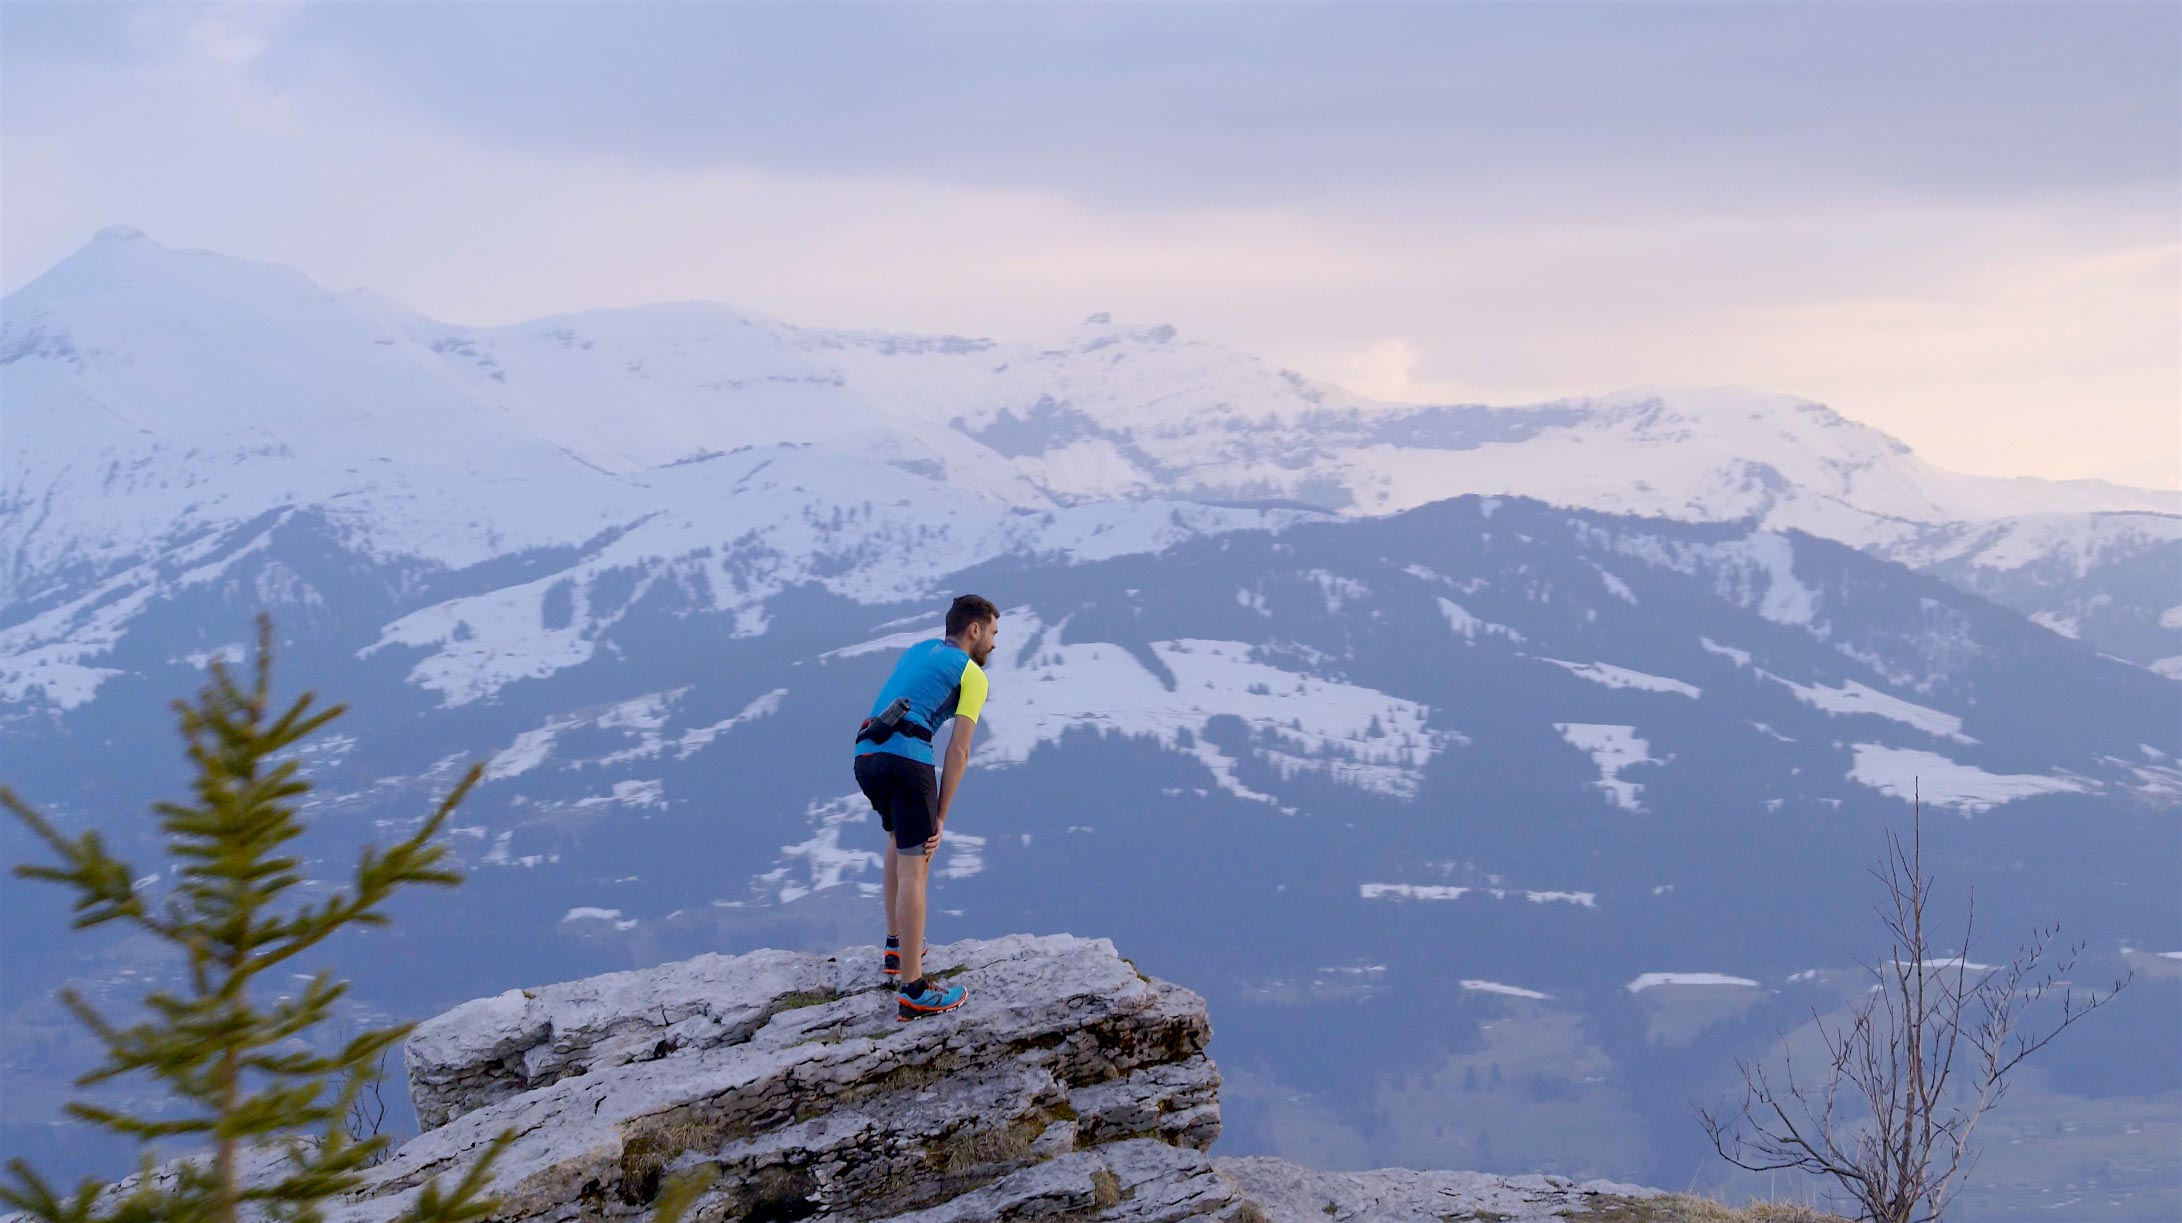 Prise de vue drone en montagne